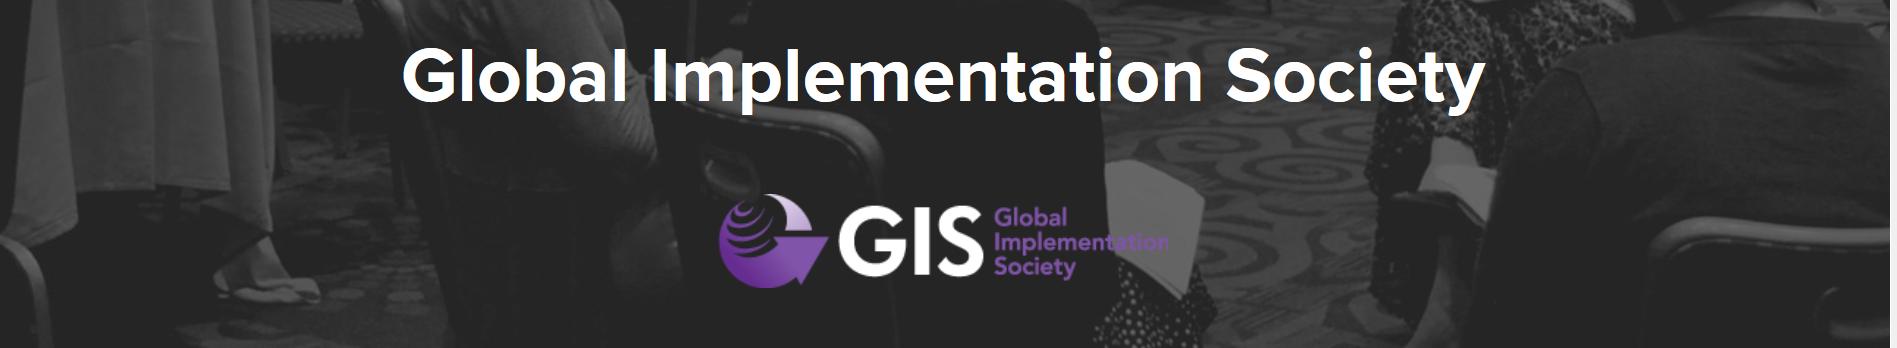 GIS Membership Purchase